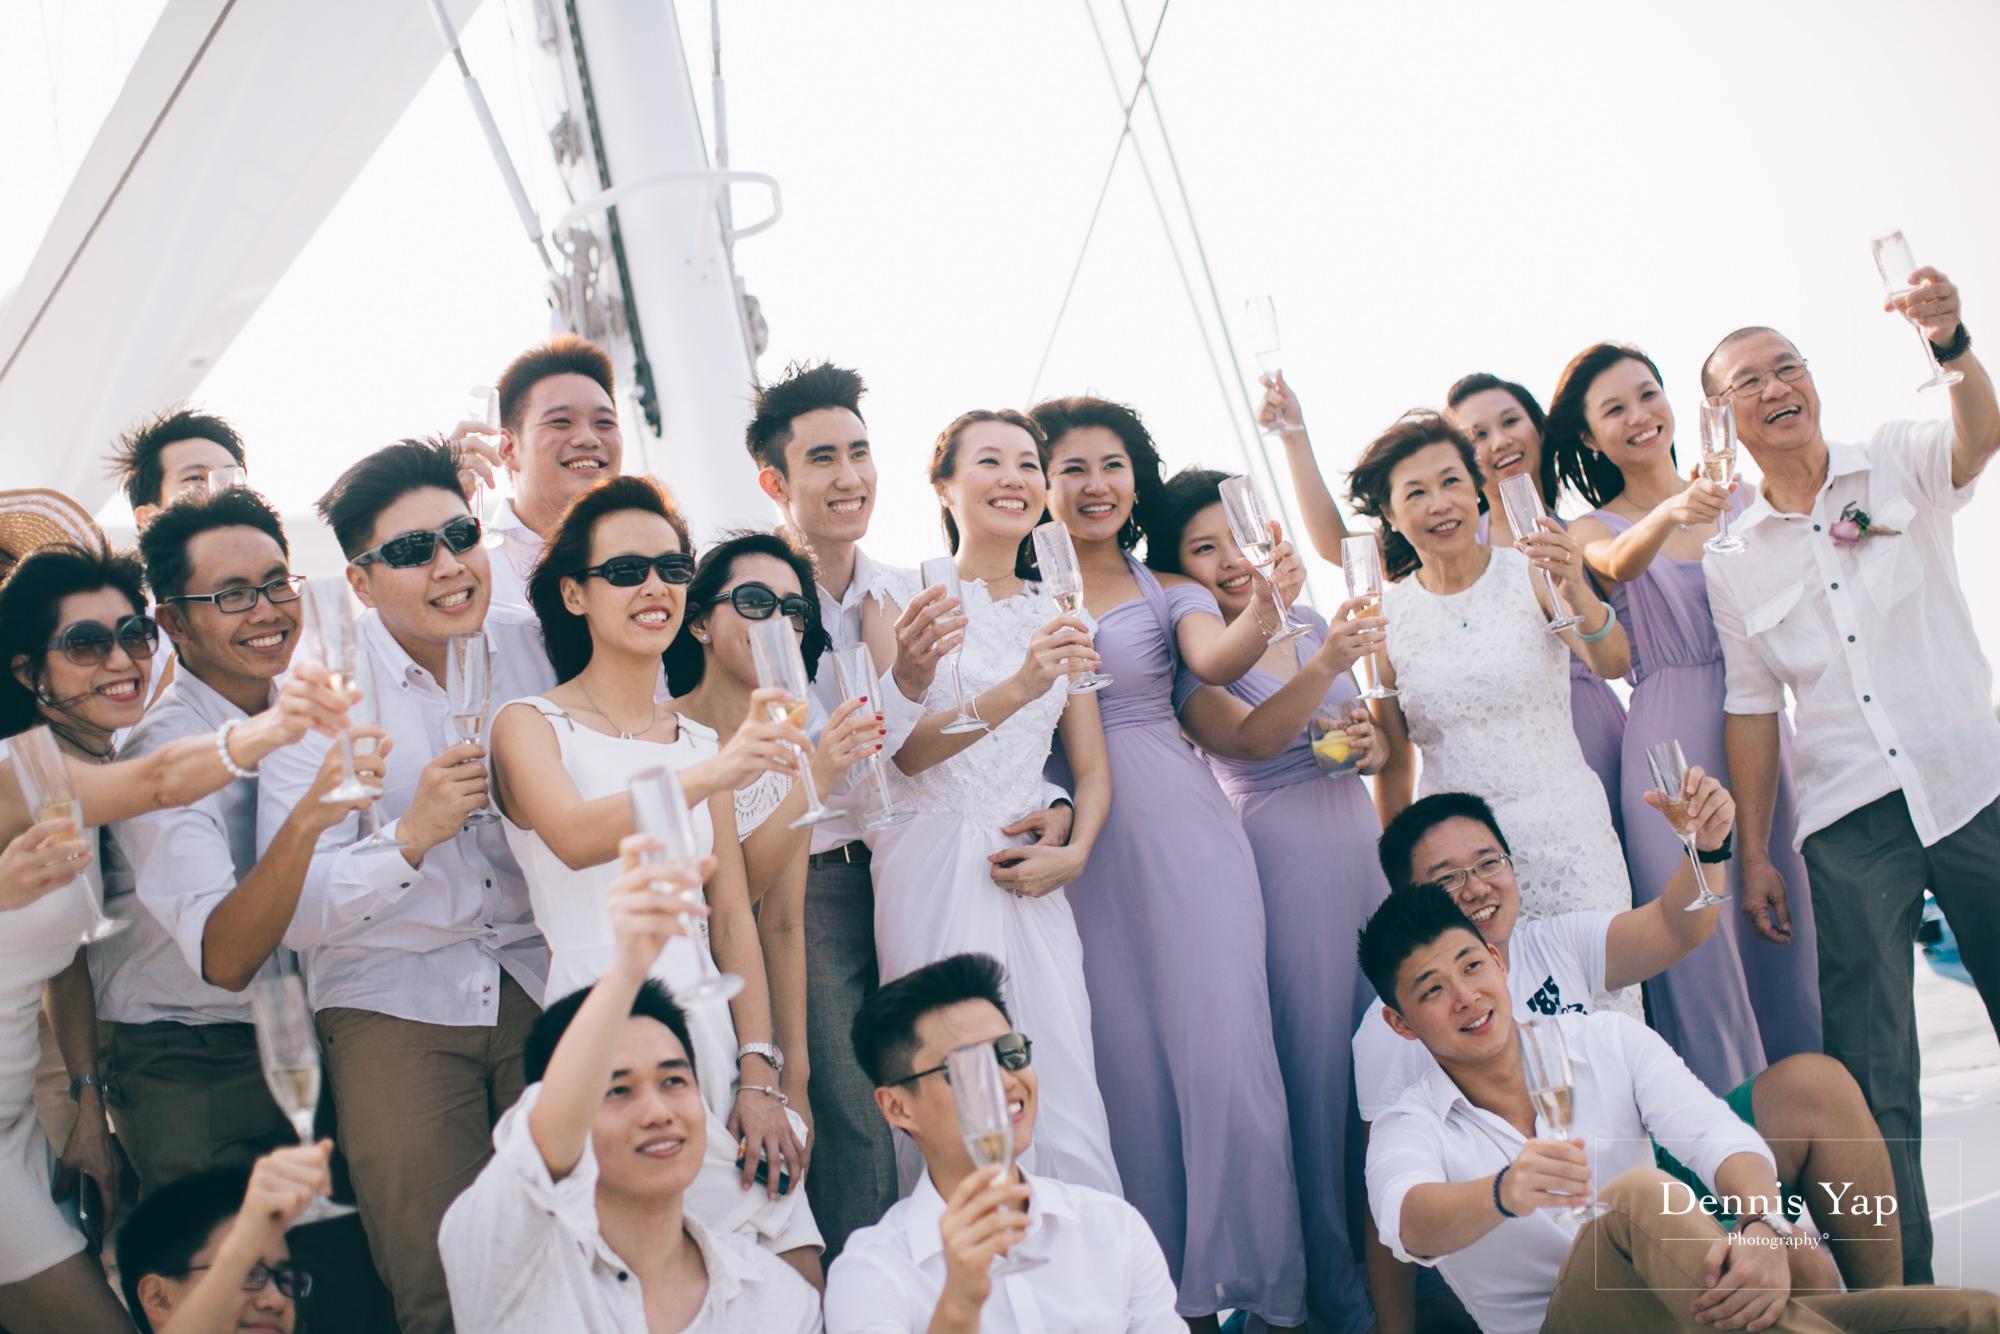 danny sherine wedding reception registration of marriage yacht fun beloved sea dennis yap photography malaysia top wedding photographer-33.jpg